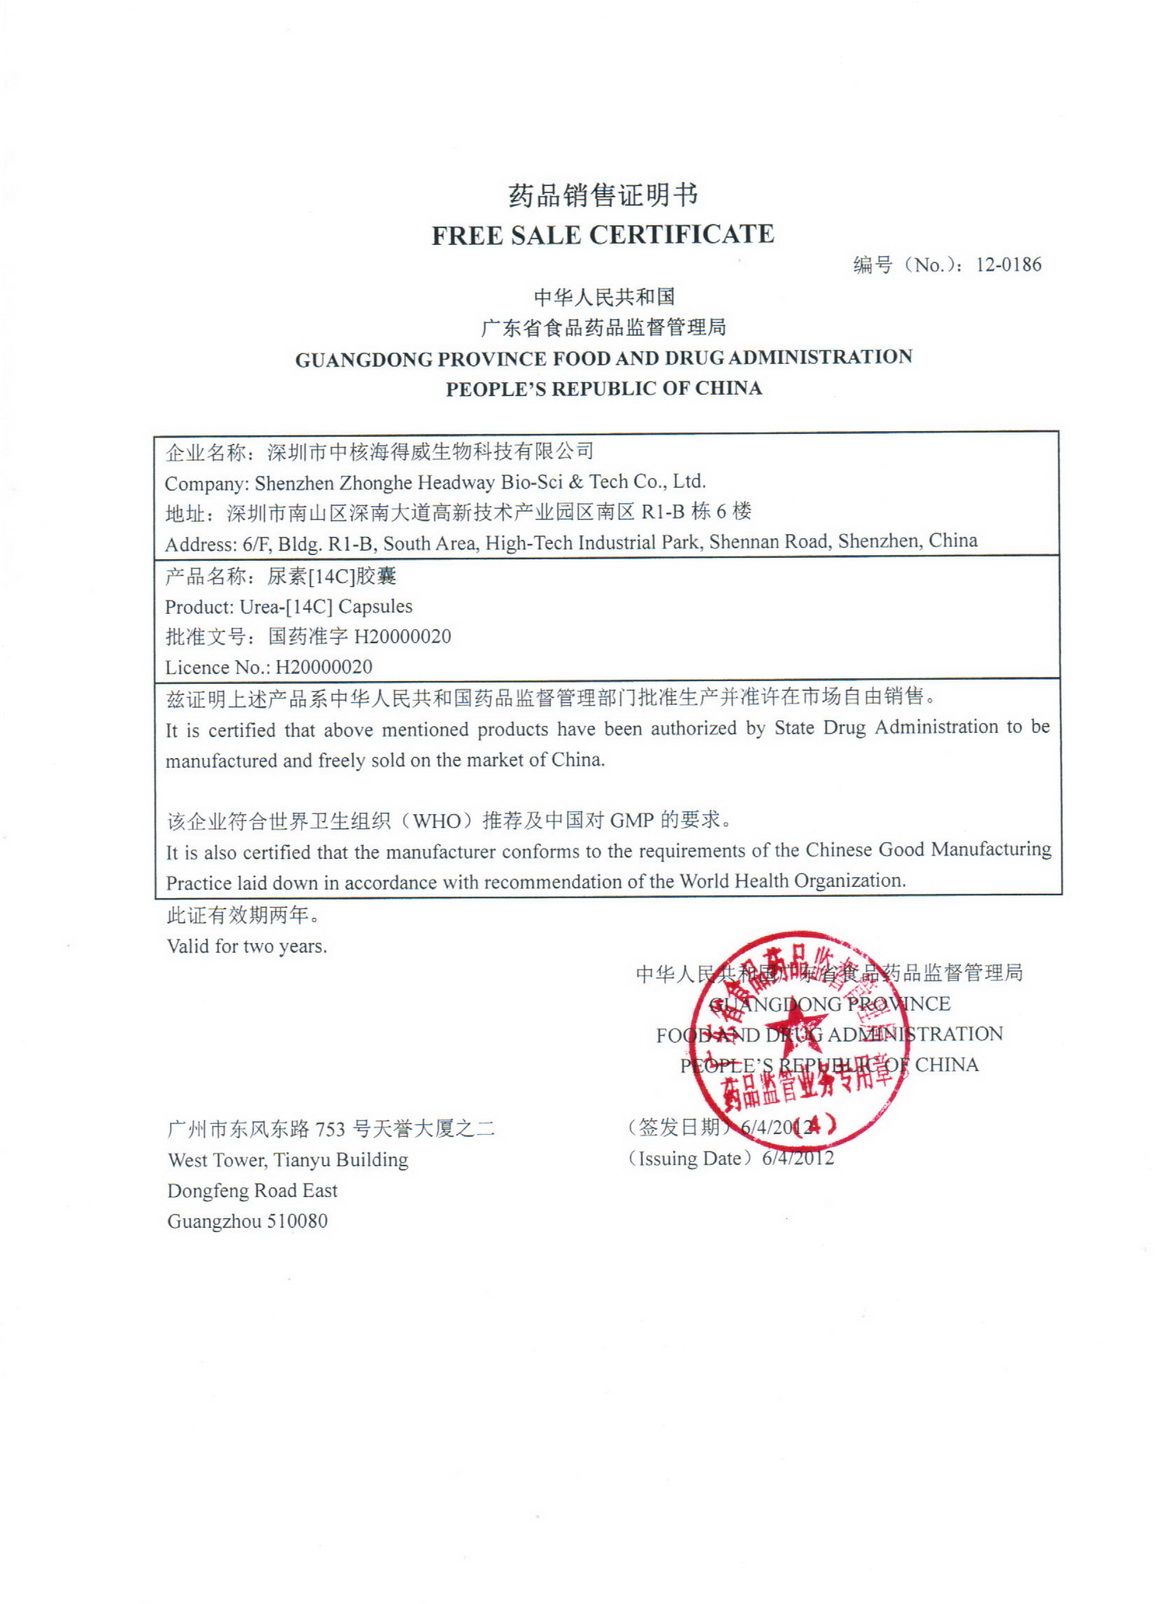 Free Sales Certificate_14C Urea Capsule